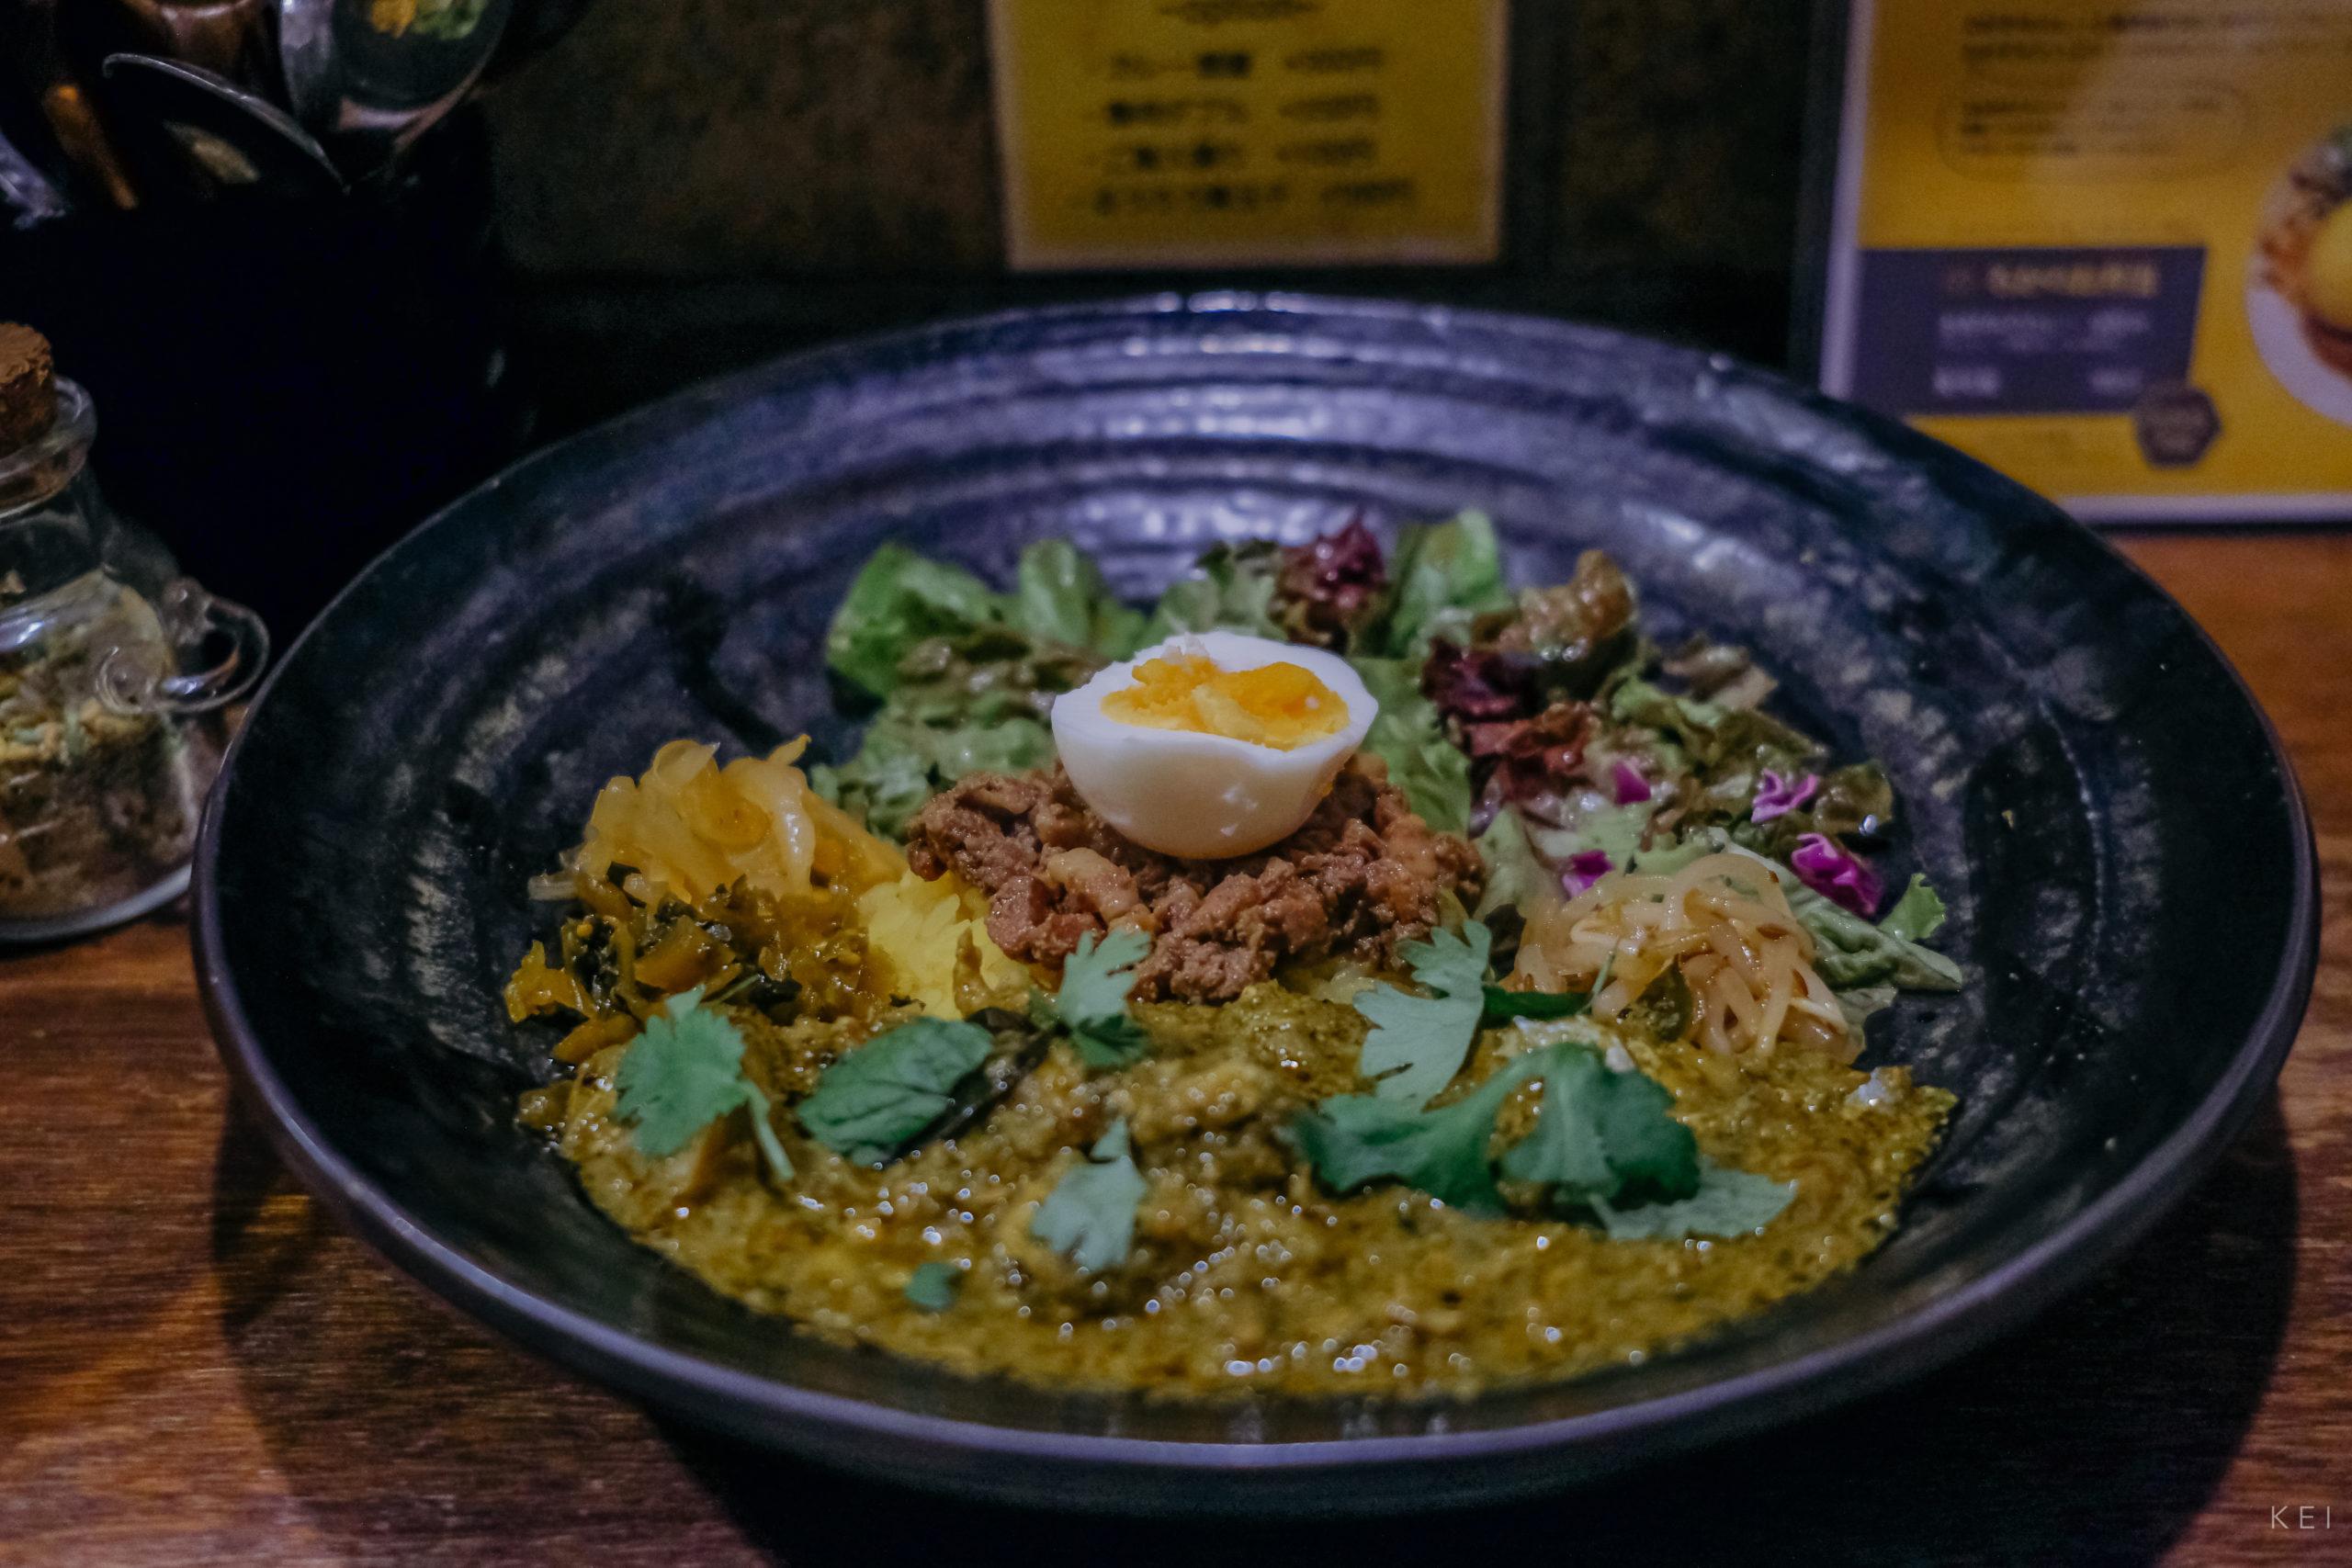 spicy curry 魯珈的咖哩+滷肉飯組合